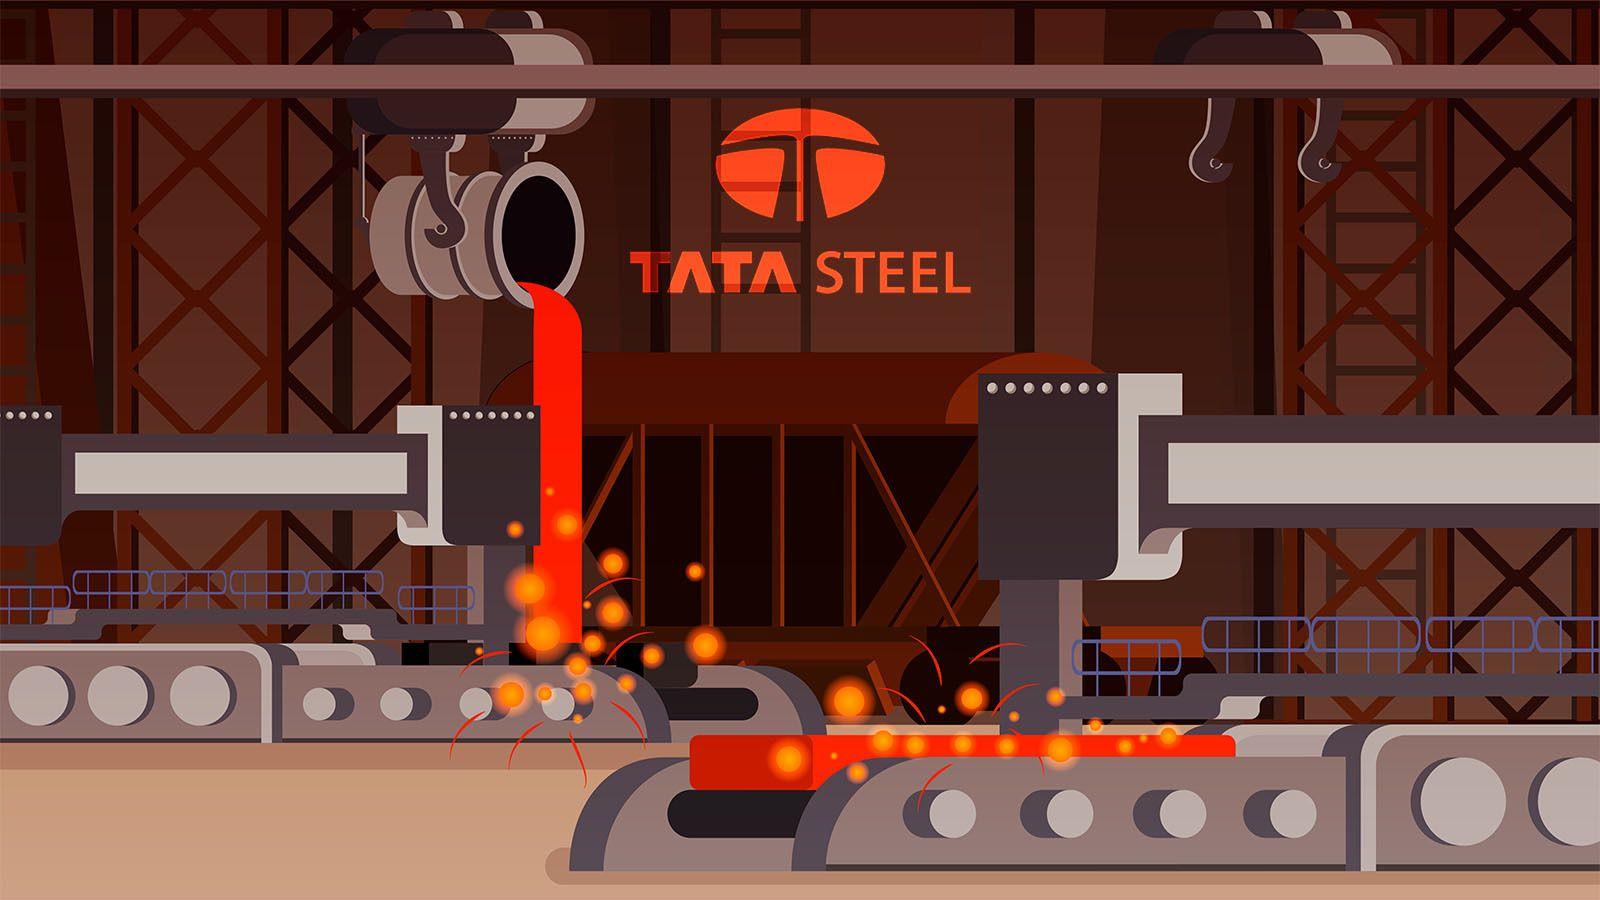 Tata Steel's purple patch